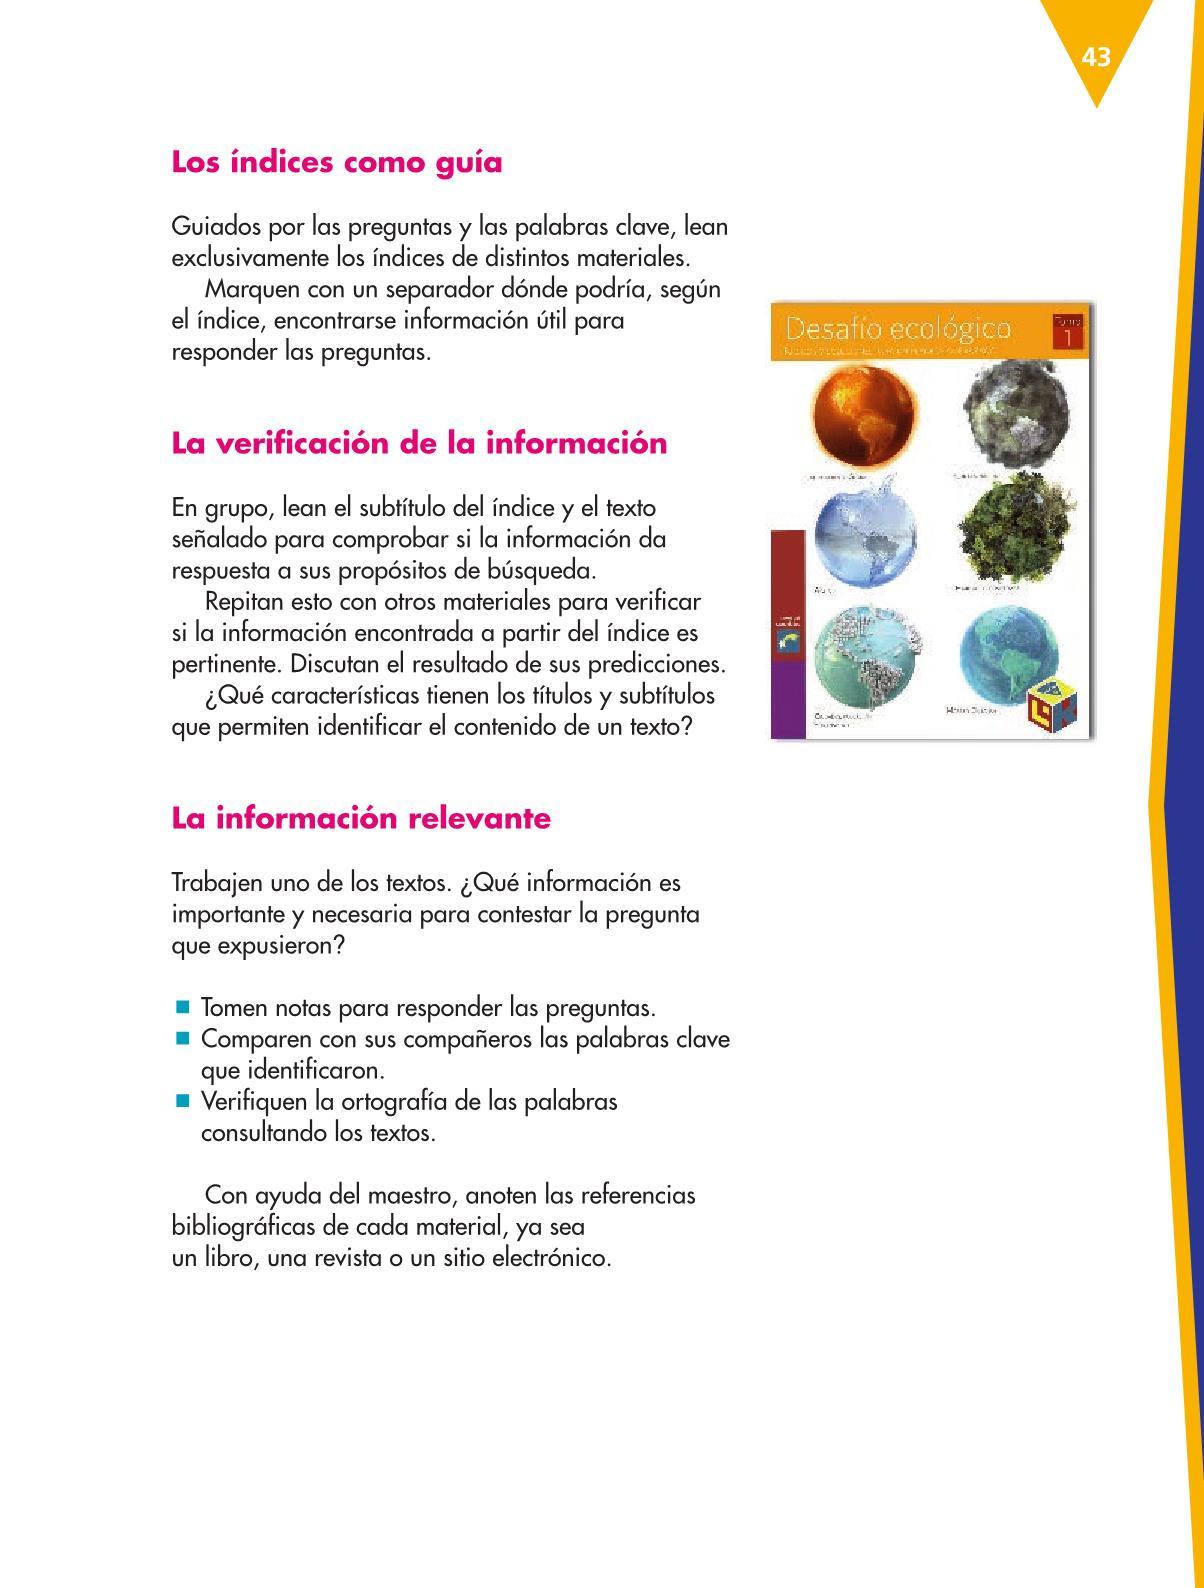 Español Libro para el alumnoquintoPagina 43